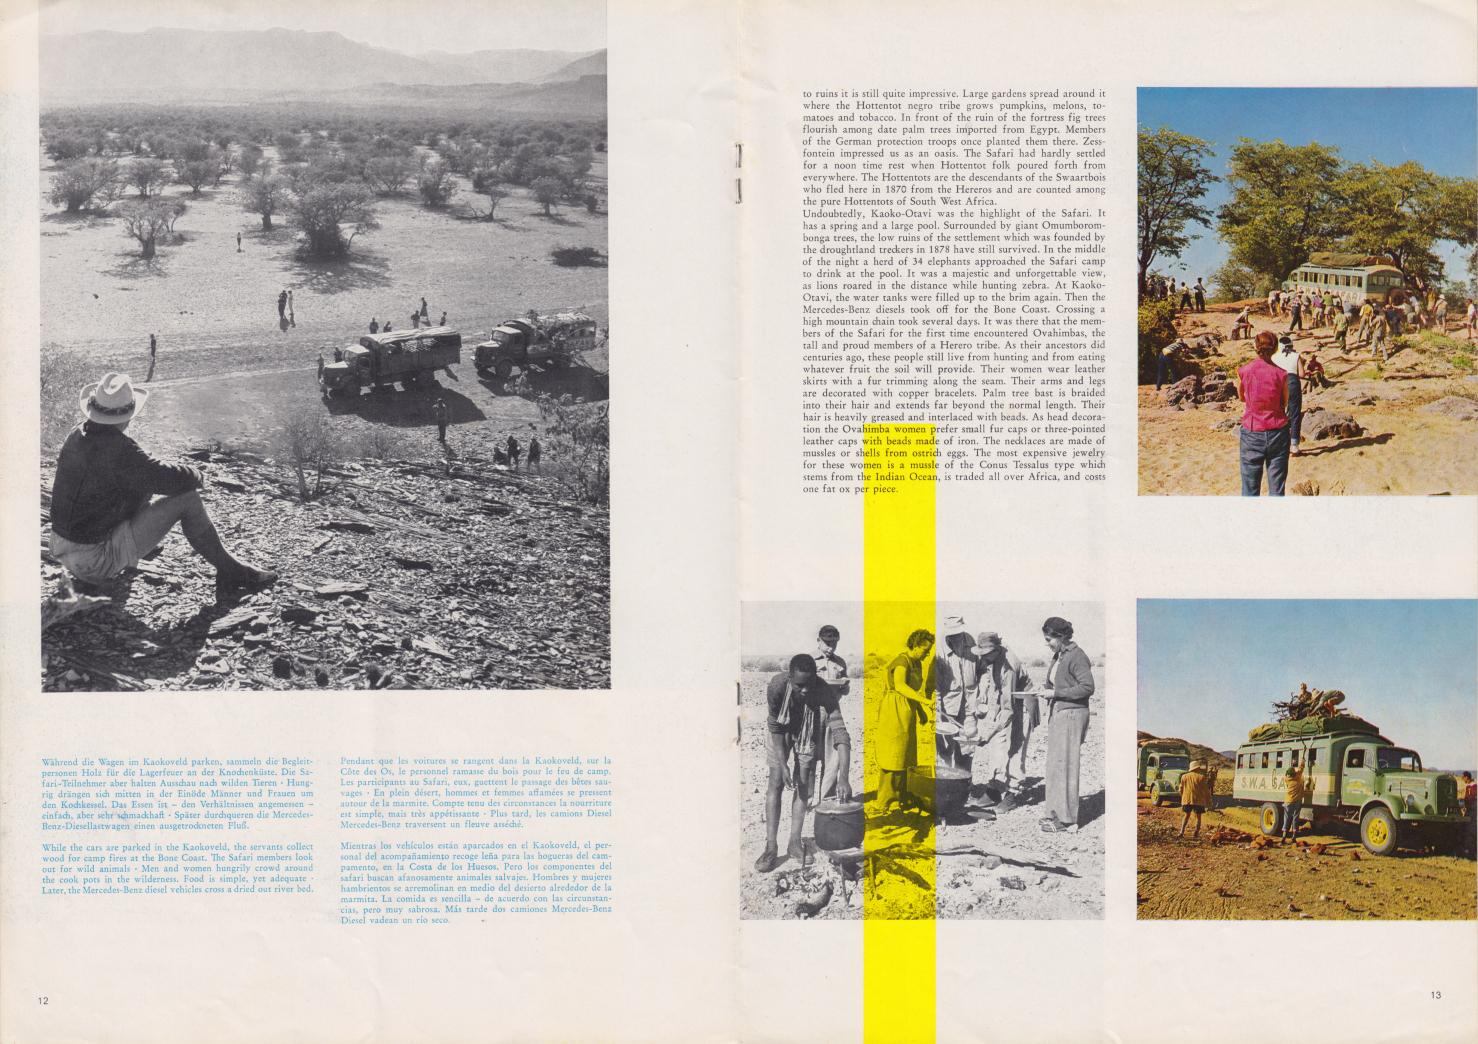 (REVISTA): Periódico In aller welt n.º 37 - Mercedes-Benz no mundo - 1959 - multilingue 007